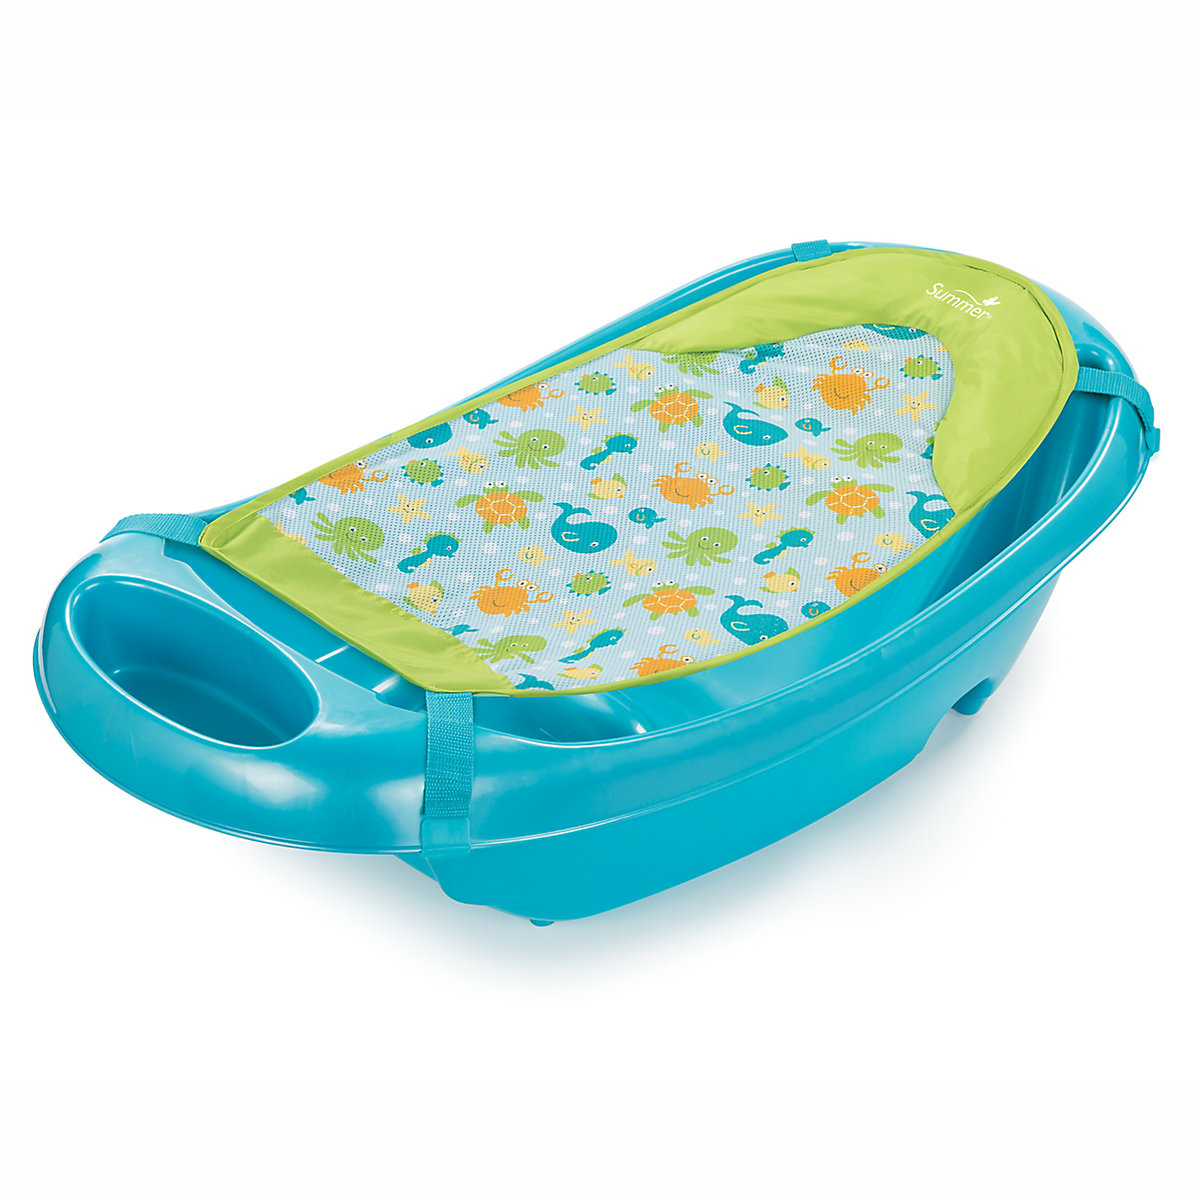 Splish & Splash Bath - Blue